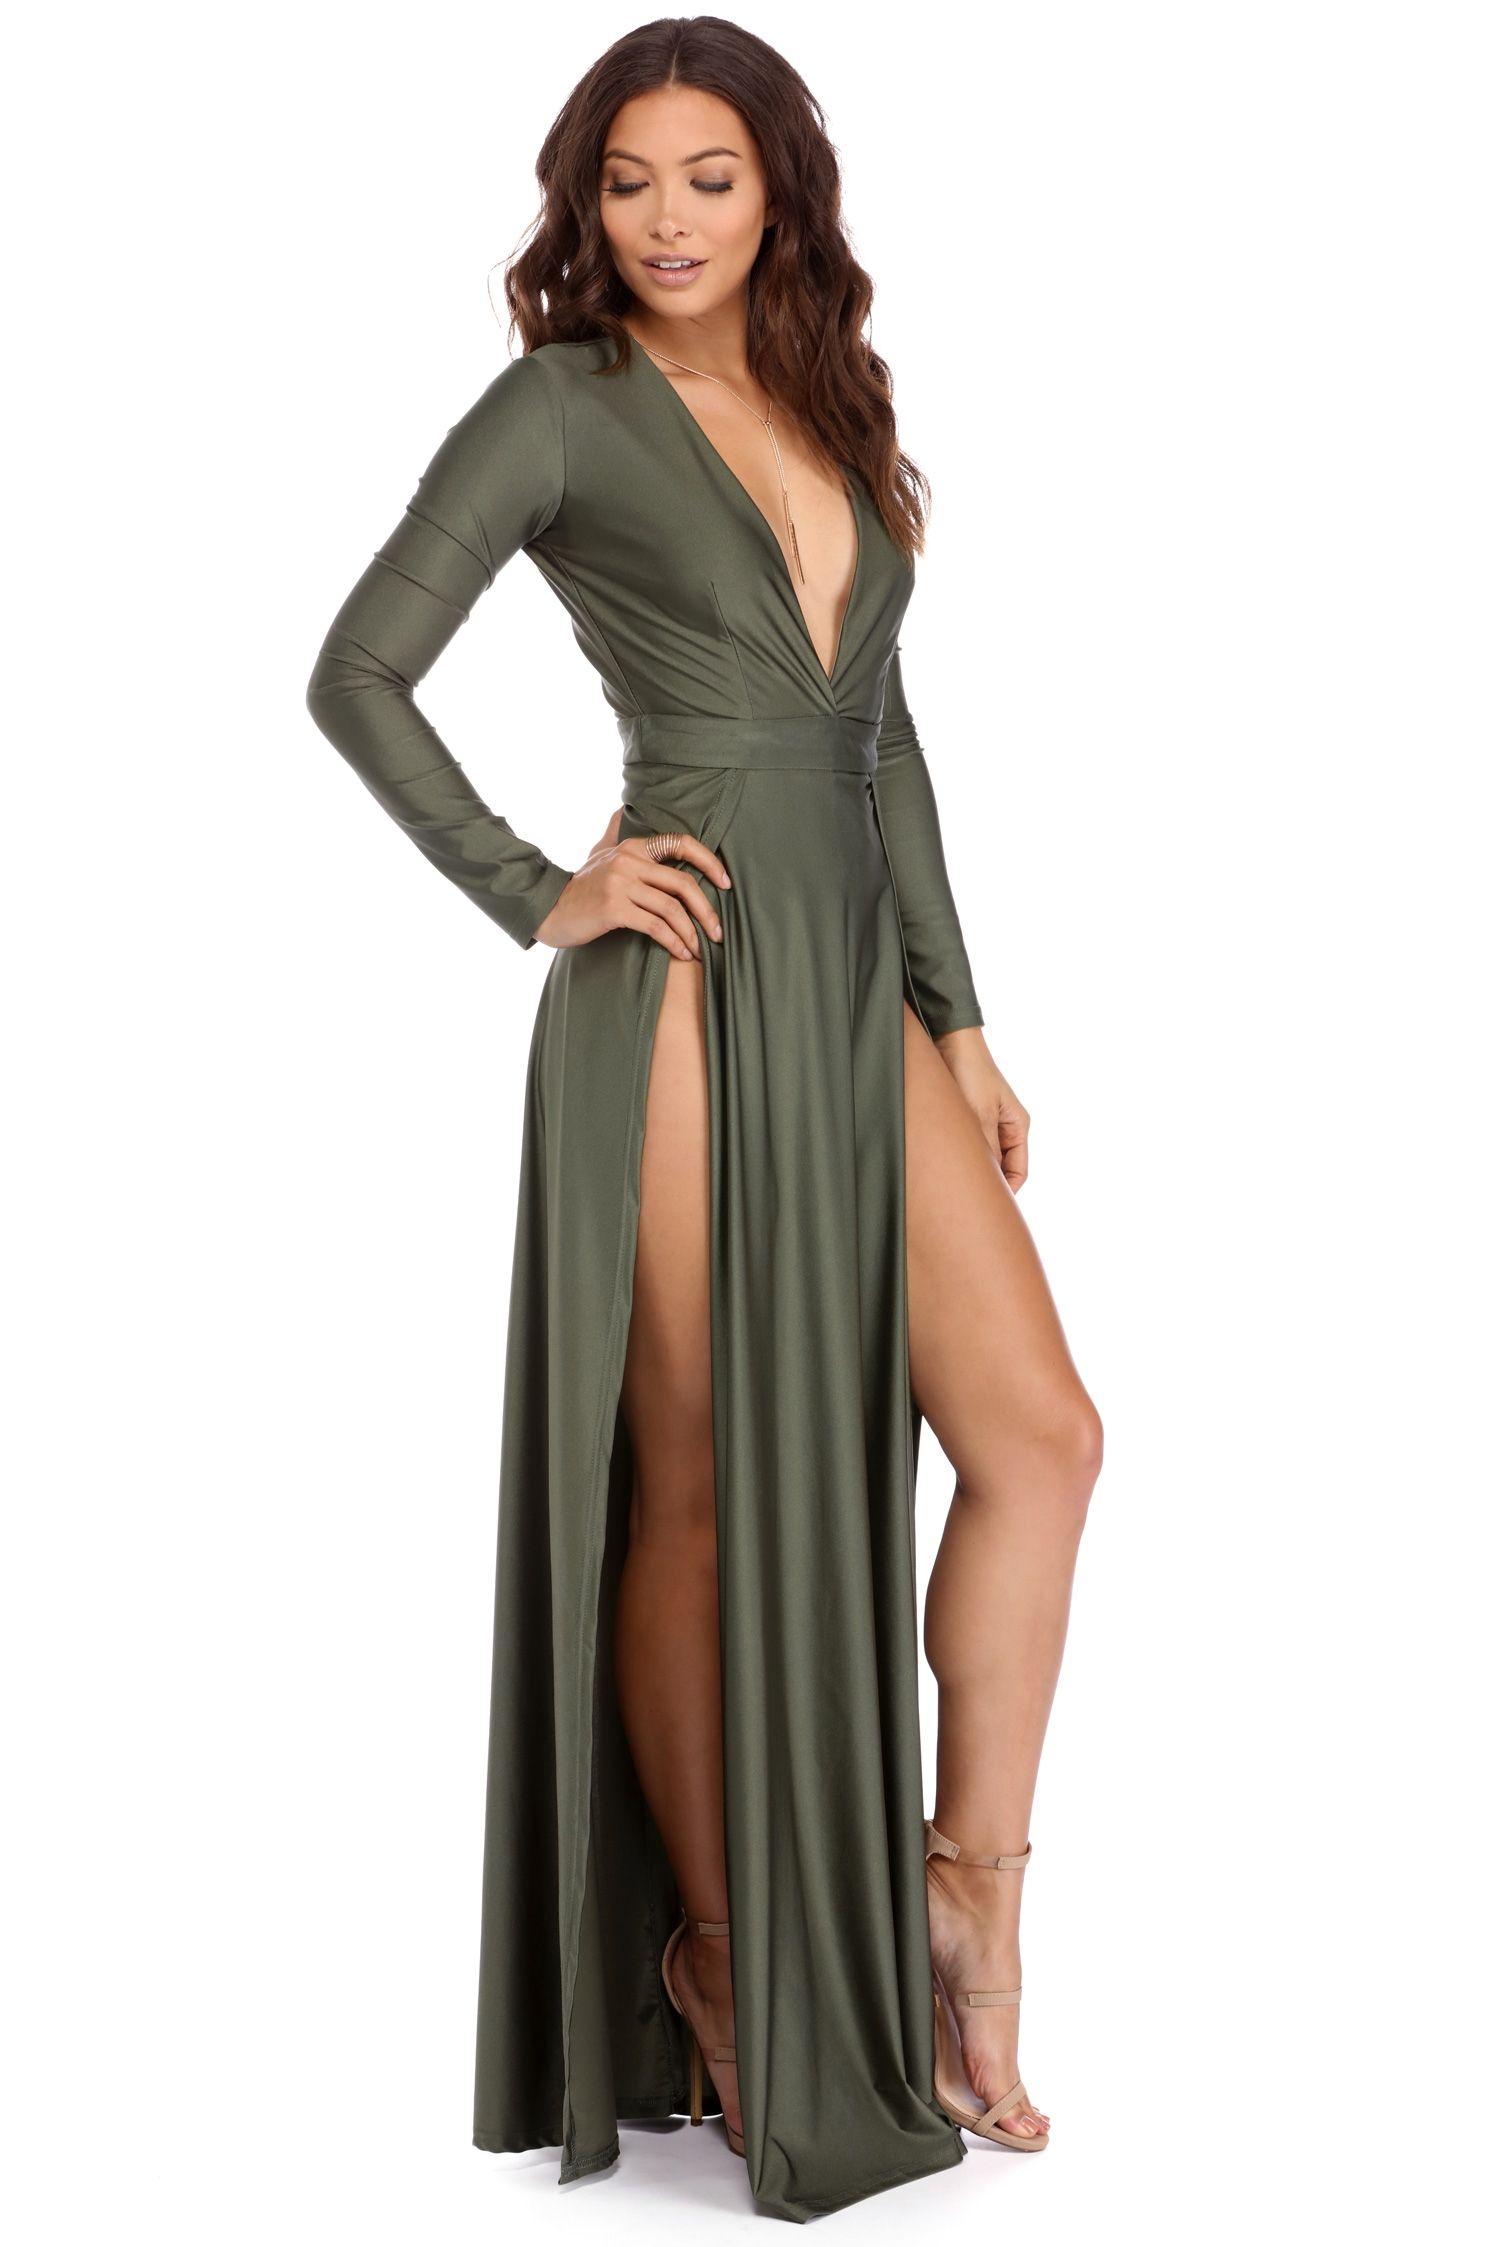 Desiree olive double slit dress my idea of heaven